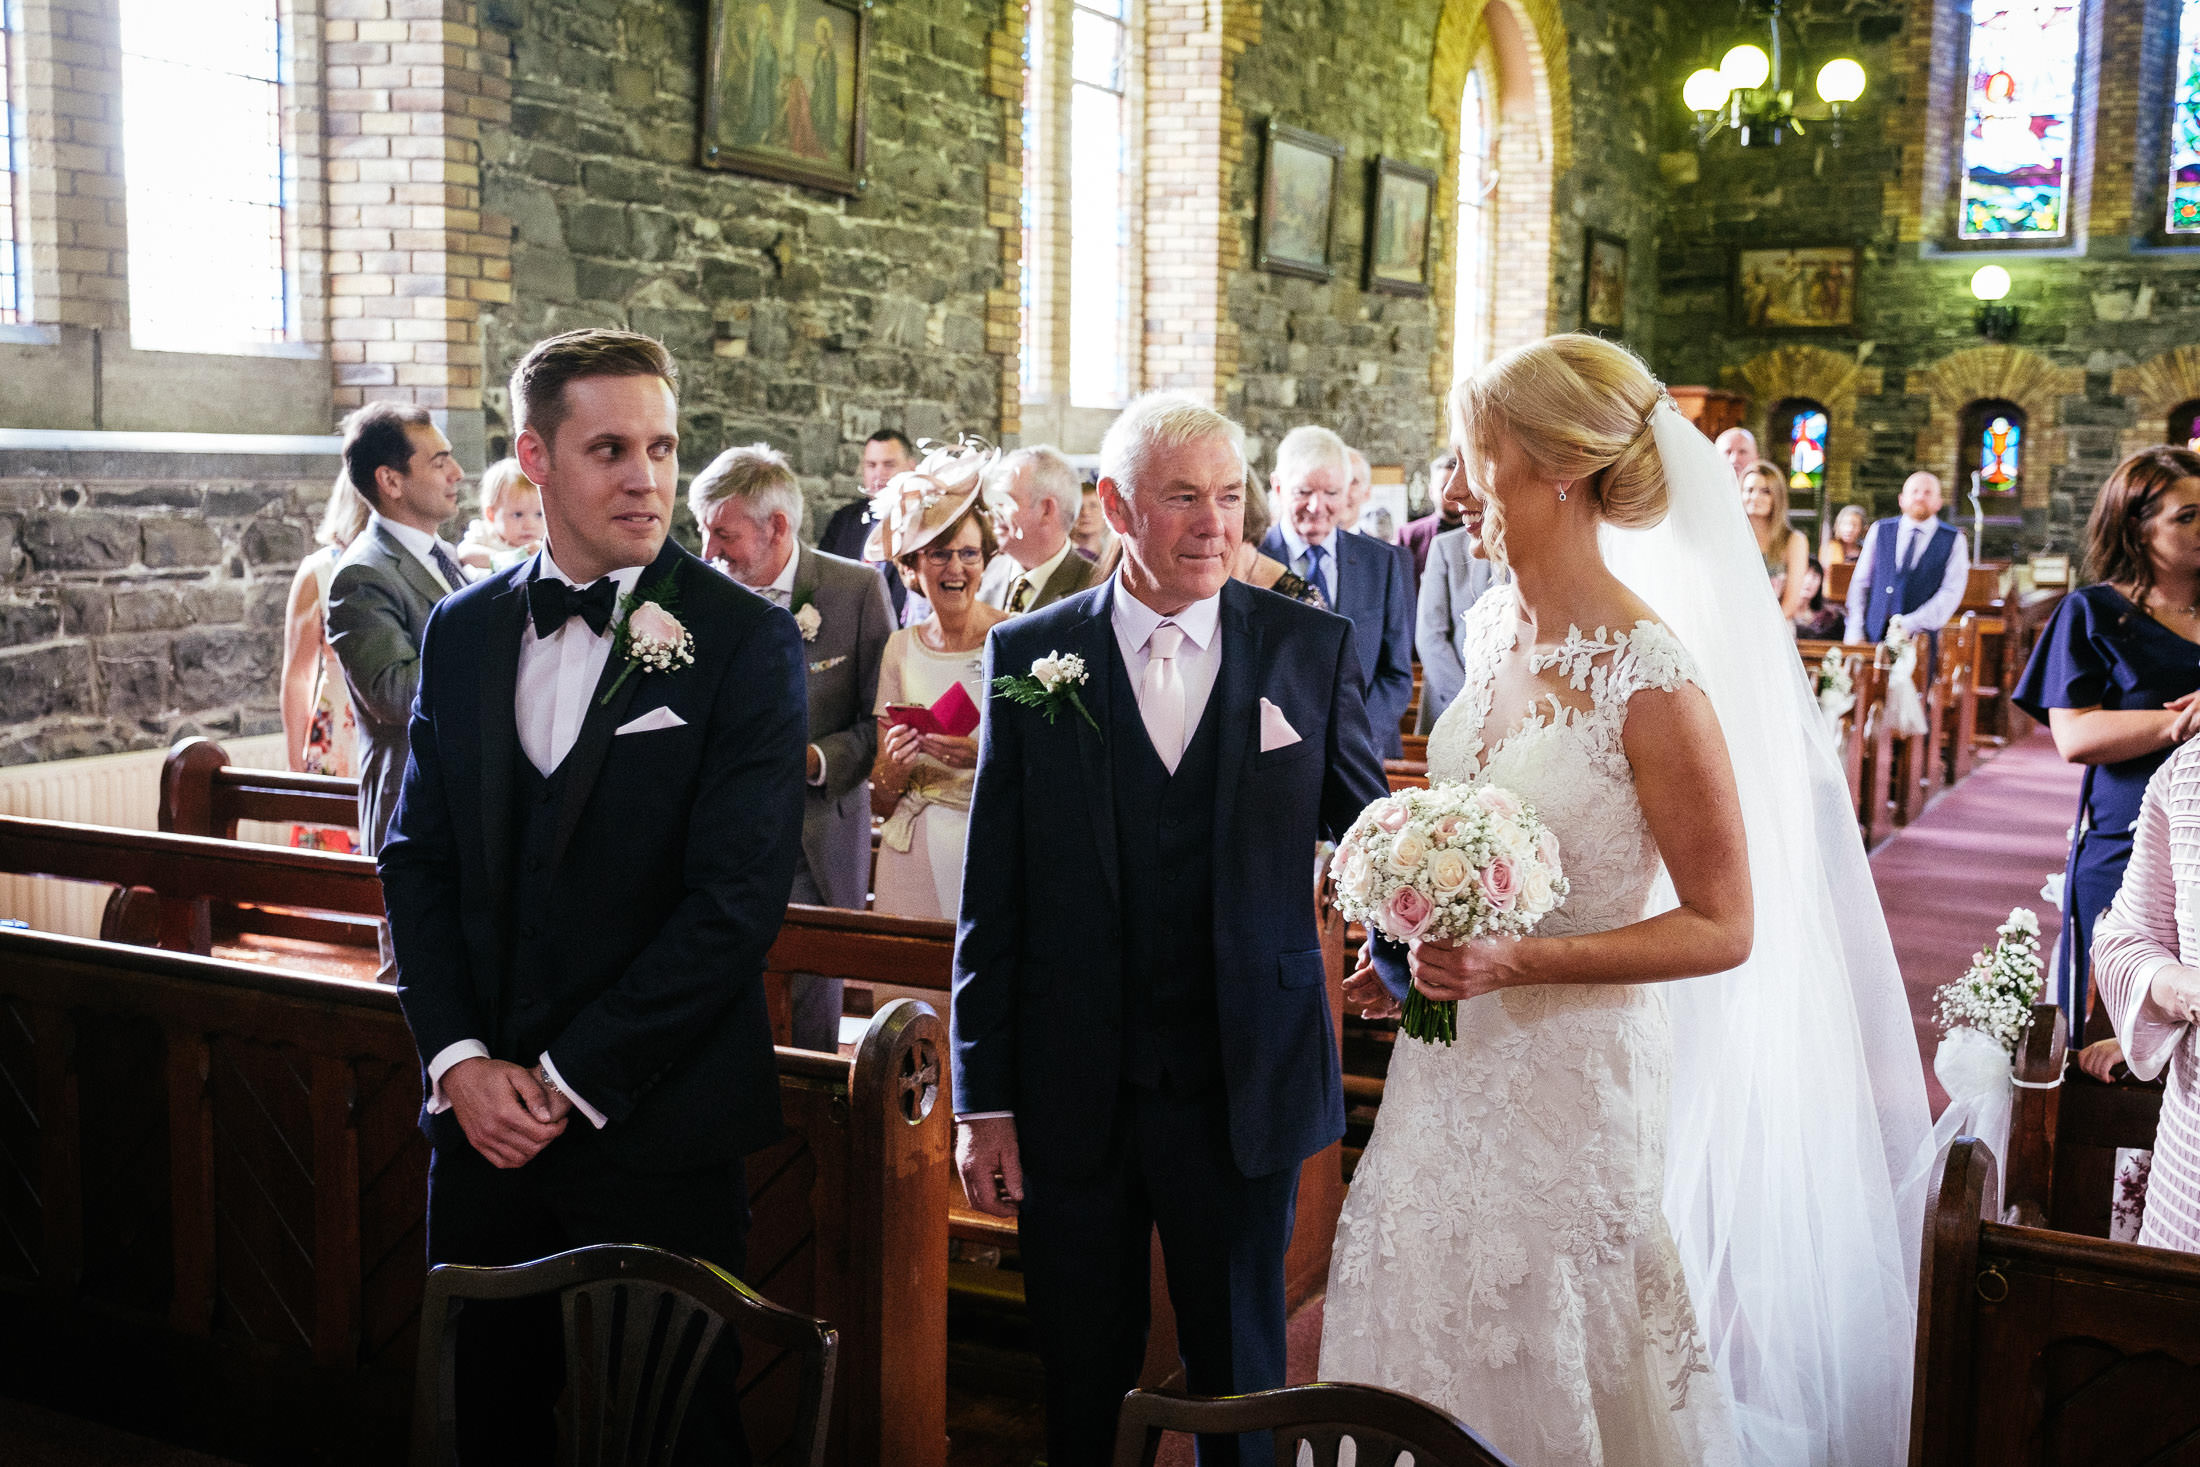 Knightsbrook Hotel Trim Castle Wedding Photographer 40